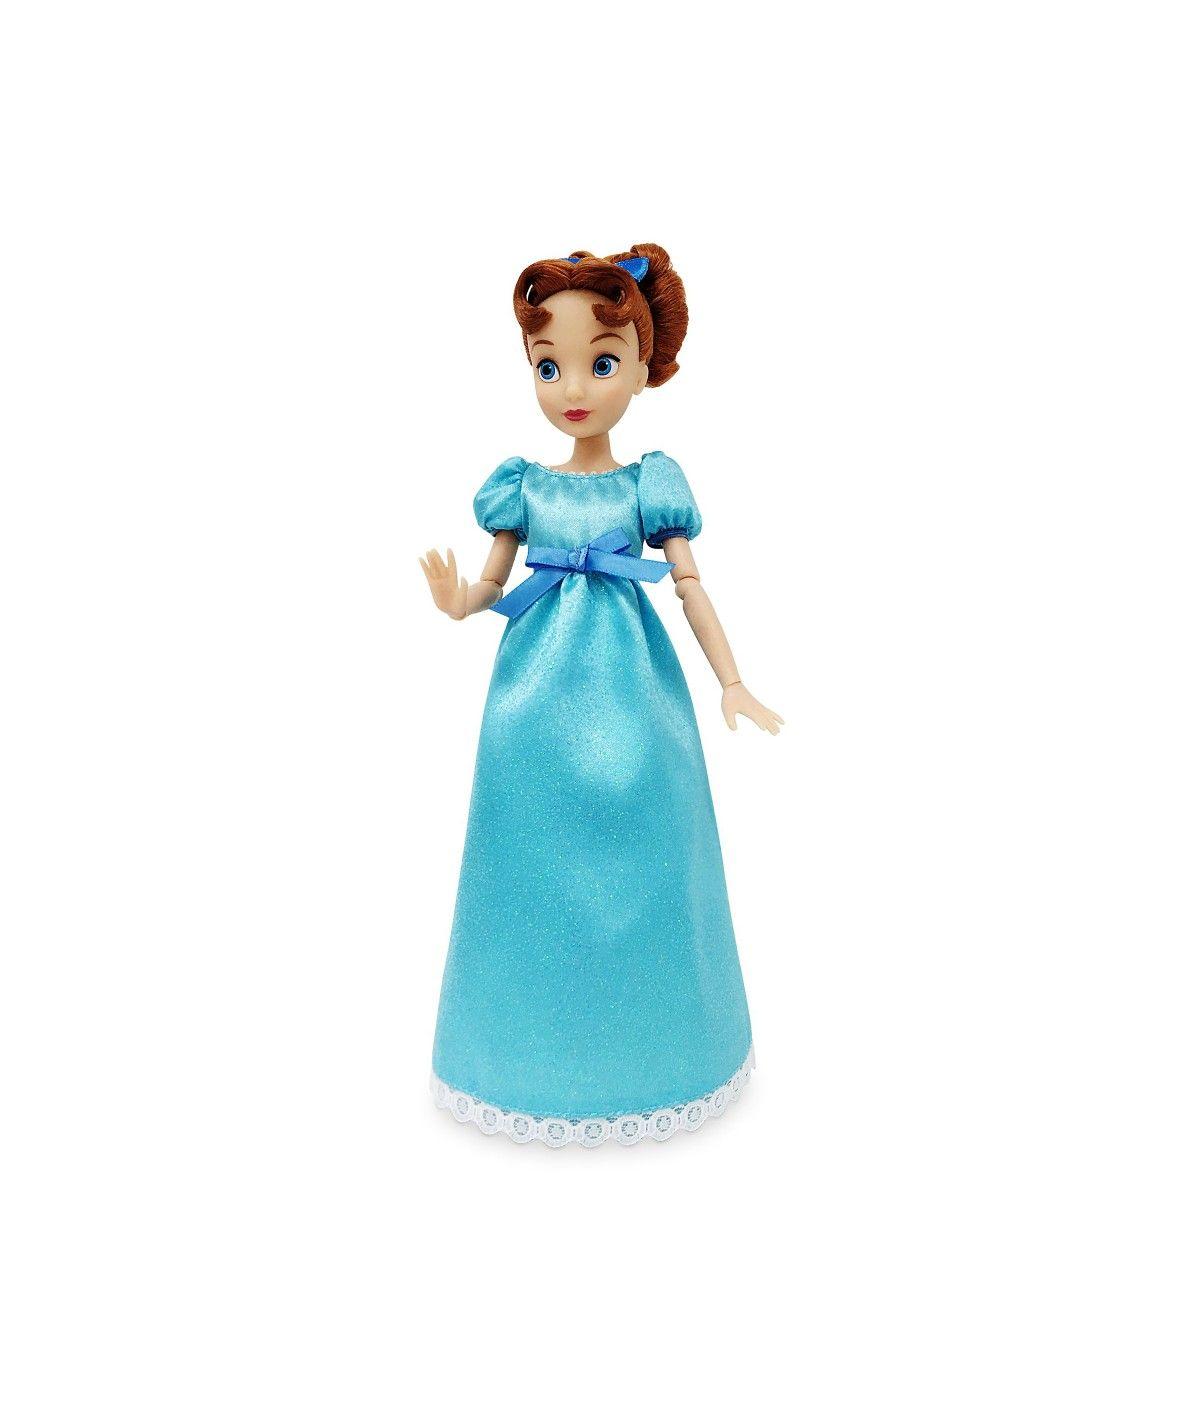 Bambola Wendy Darling Peter Pan Disney Store